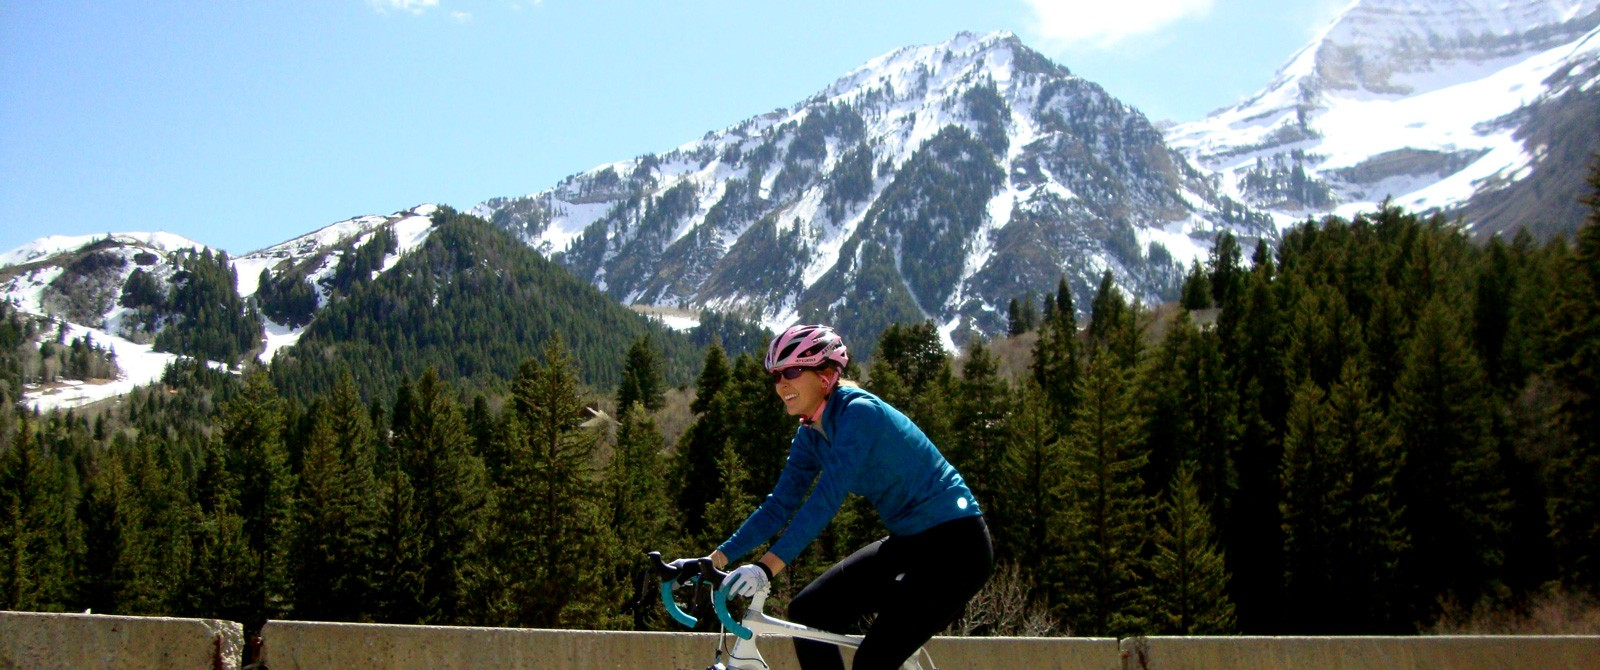 Meagan Coates, Trip Design Manager at Trek Travel